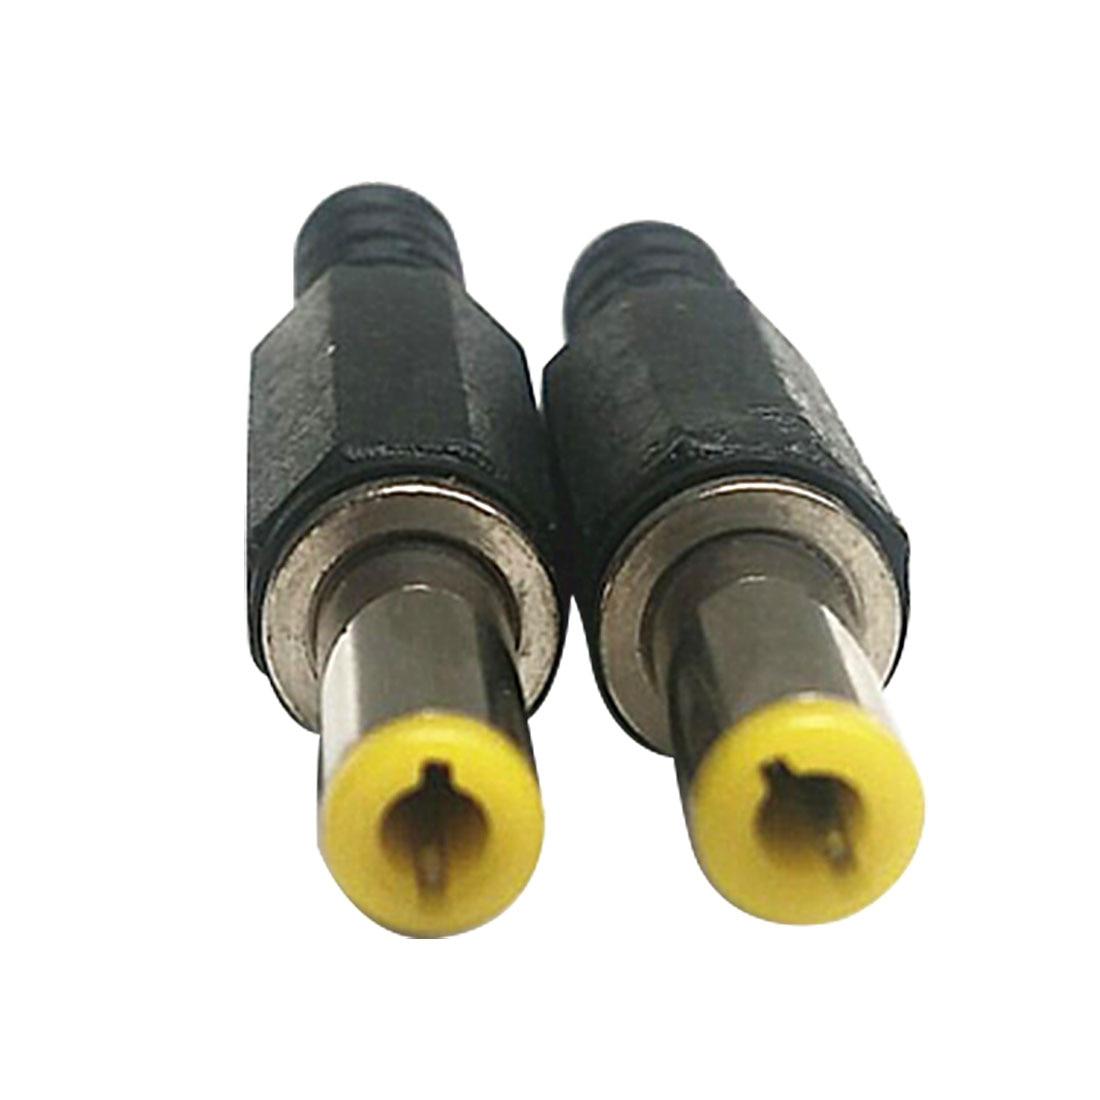 New 6Pcs Hot 5.5mm x 2.5mm DC Power Plugs Male Barrel Connectors Black and YellowNew 6Pcs Hot 5.5mm x 2.5mm DC Power Plugs Male Barrel Connectors Black and Yellow